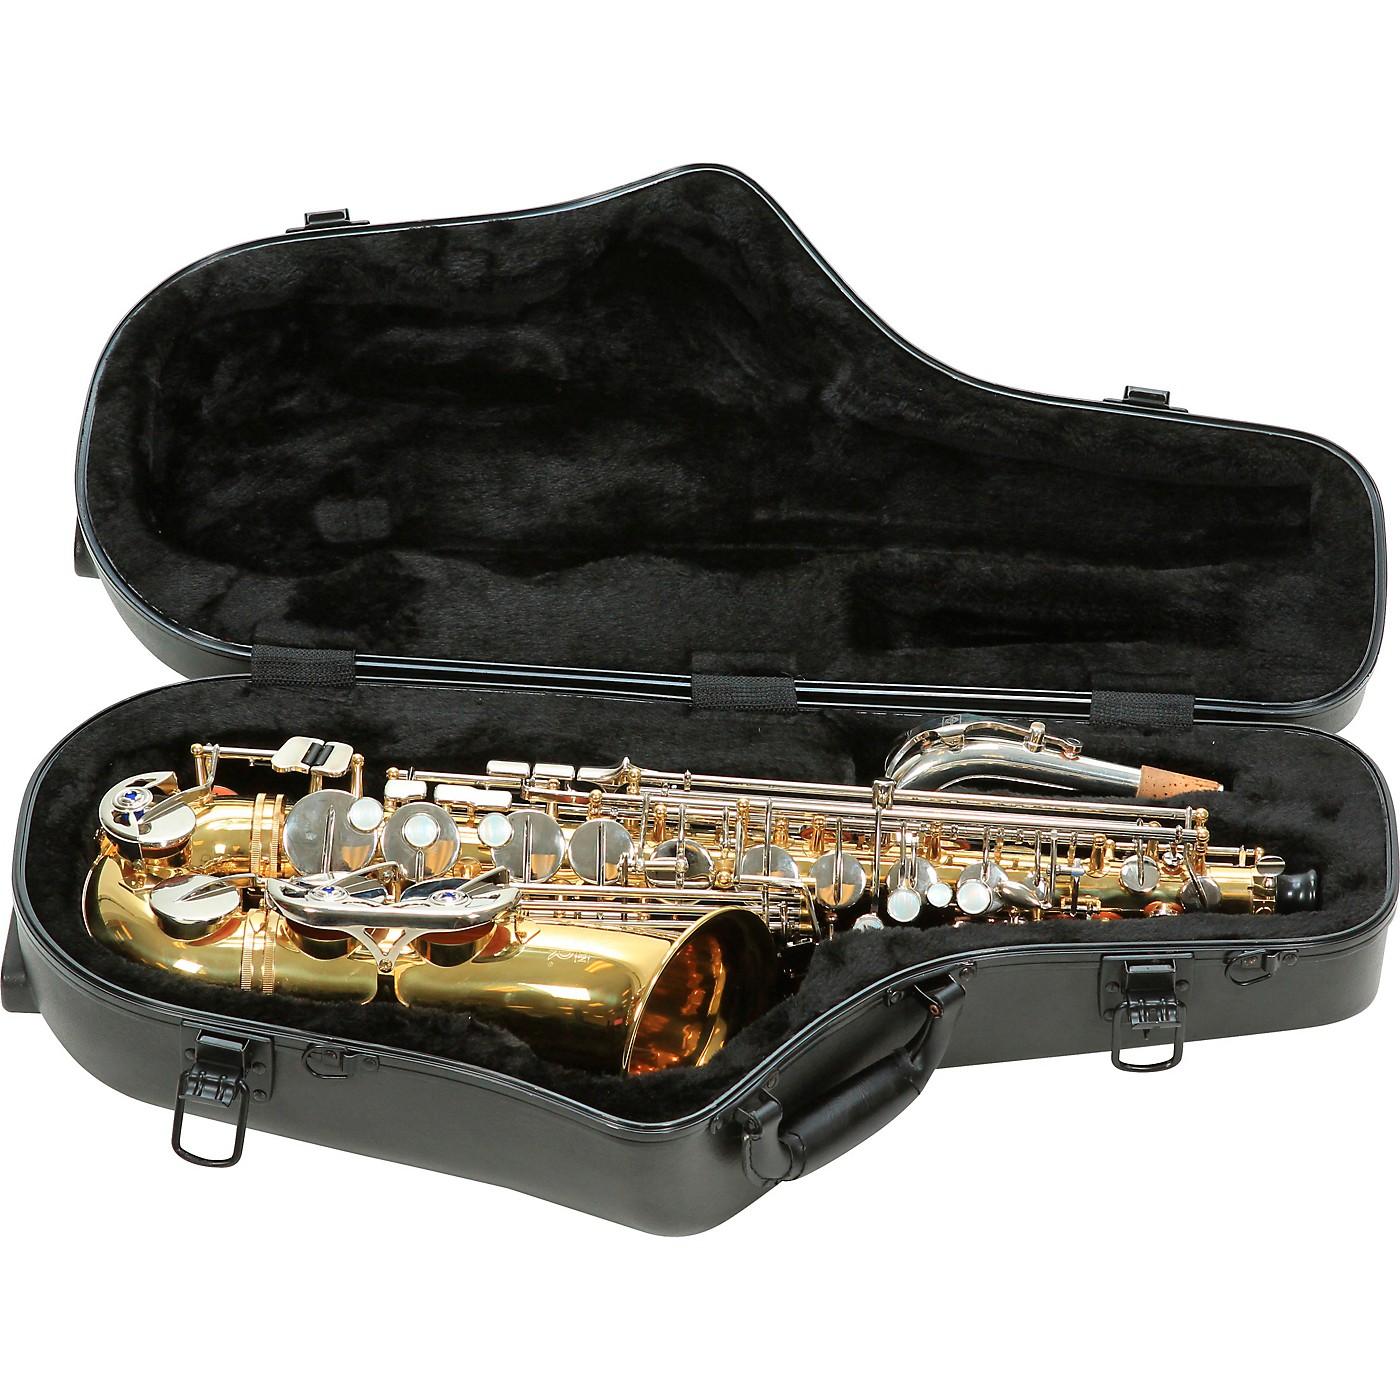 SKB SKB-440 Professional Contoured Alto Saxophone Case thumbnail